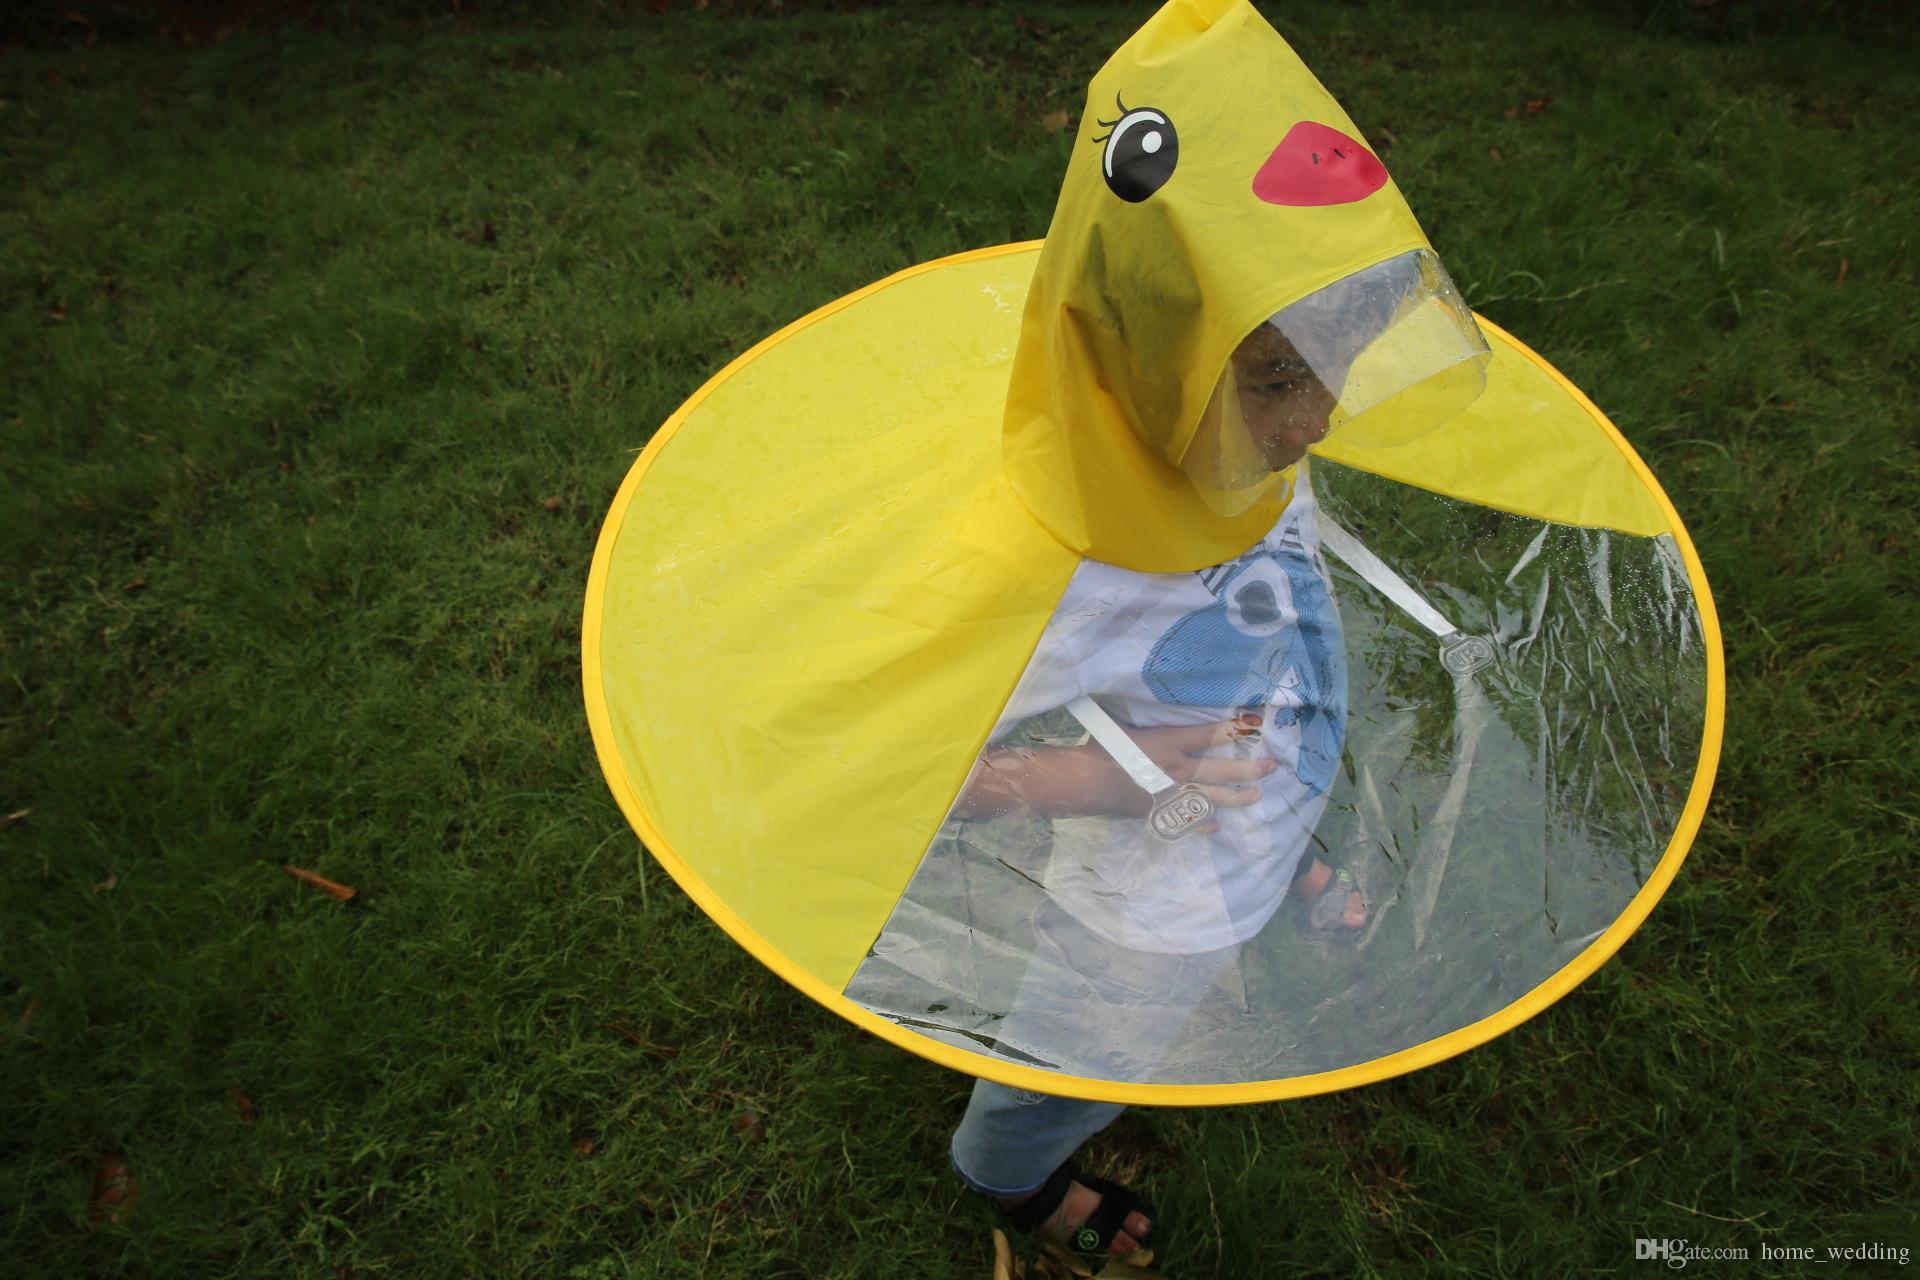 Cute Kids UFO Raincoat Rain Cover Funny Yellow Duck Raincoat Umbrella Poncho Hands Free Rainwear Waterproof